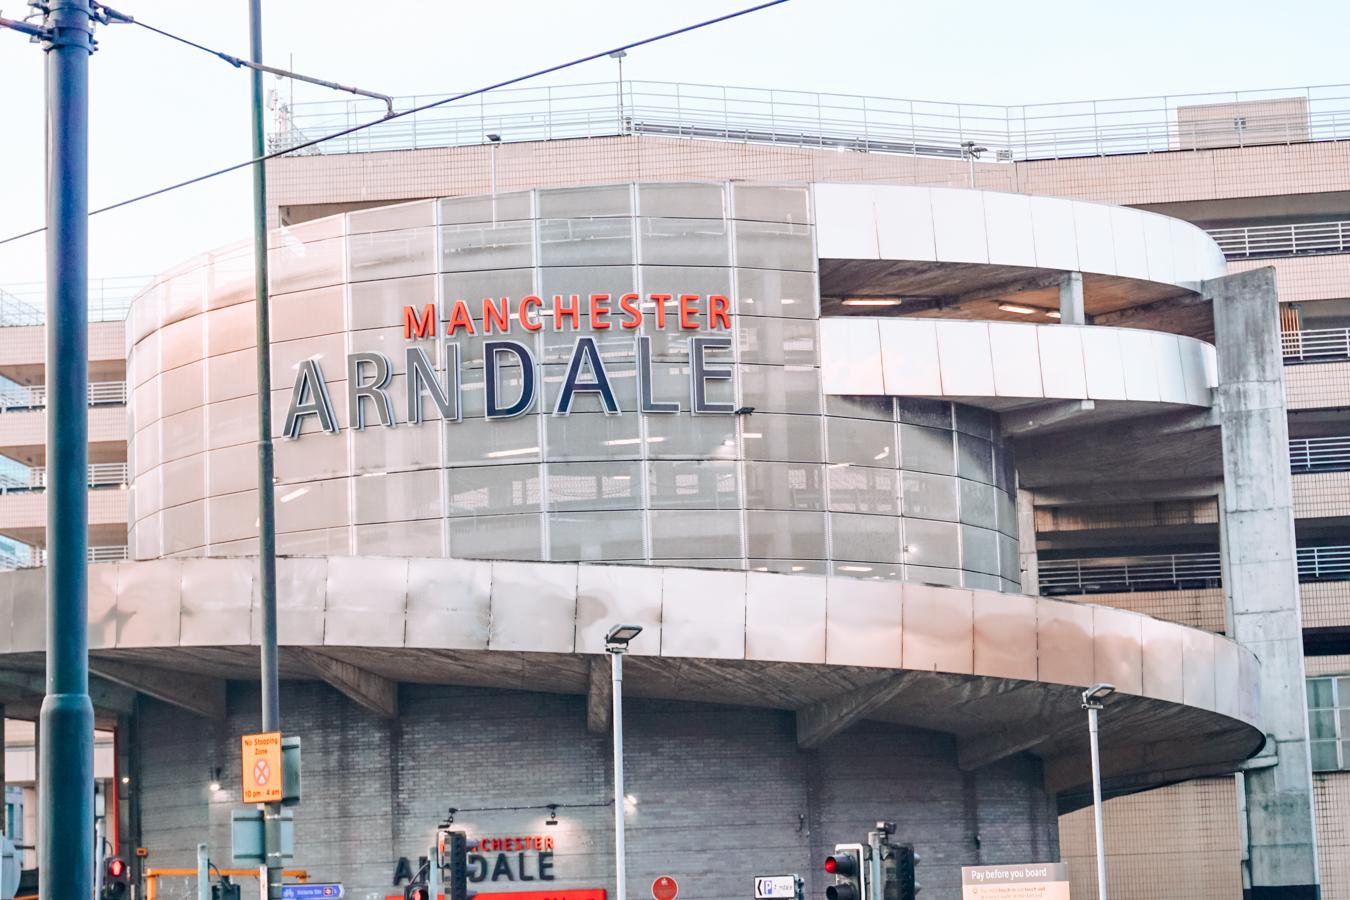 Manchester Arndale